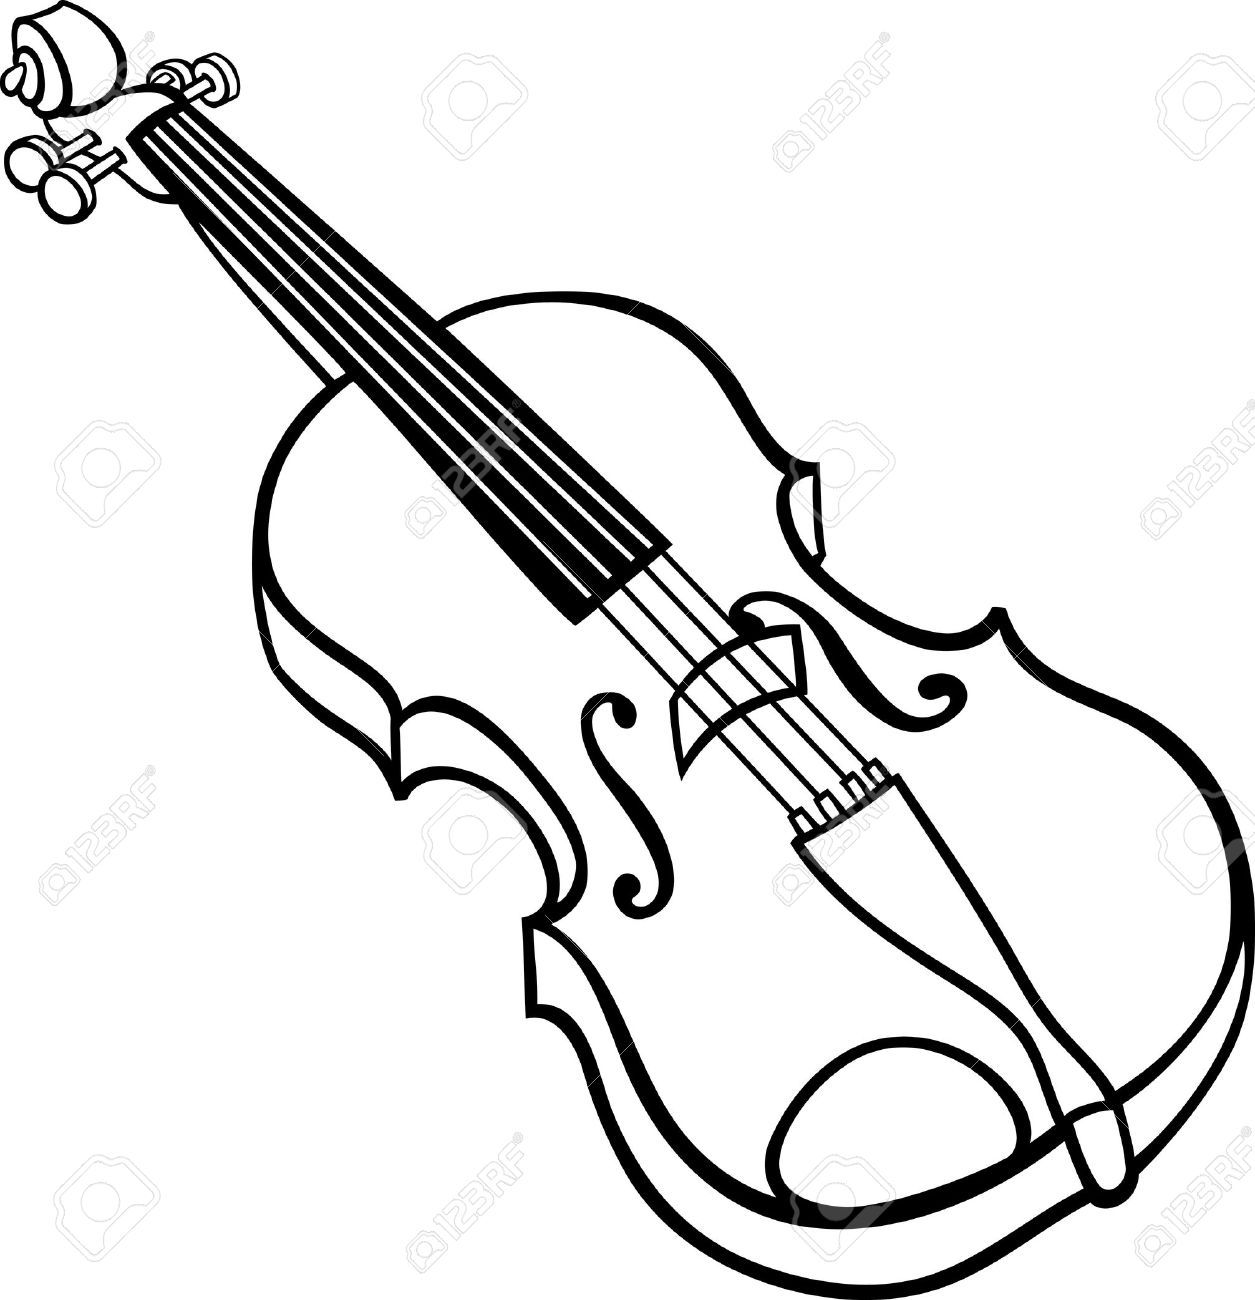 black and white cartoon illustration of violin musical instrument rh pinterest com